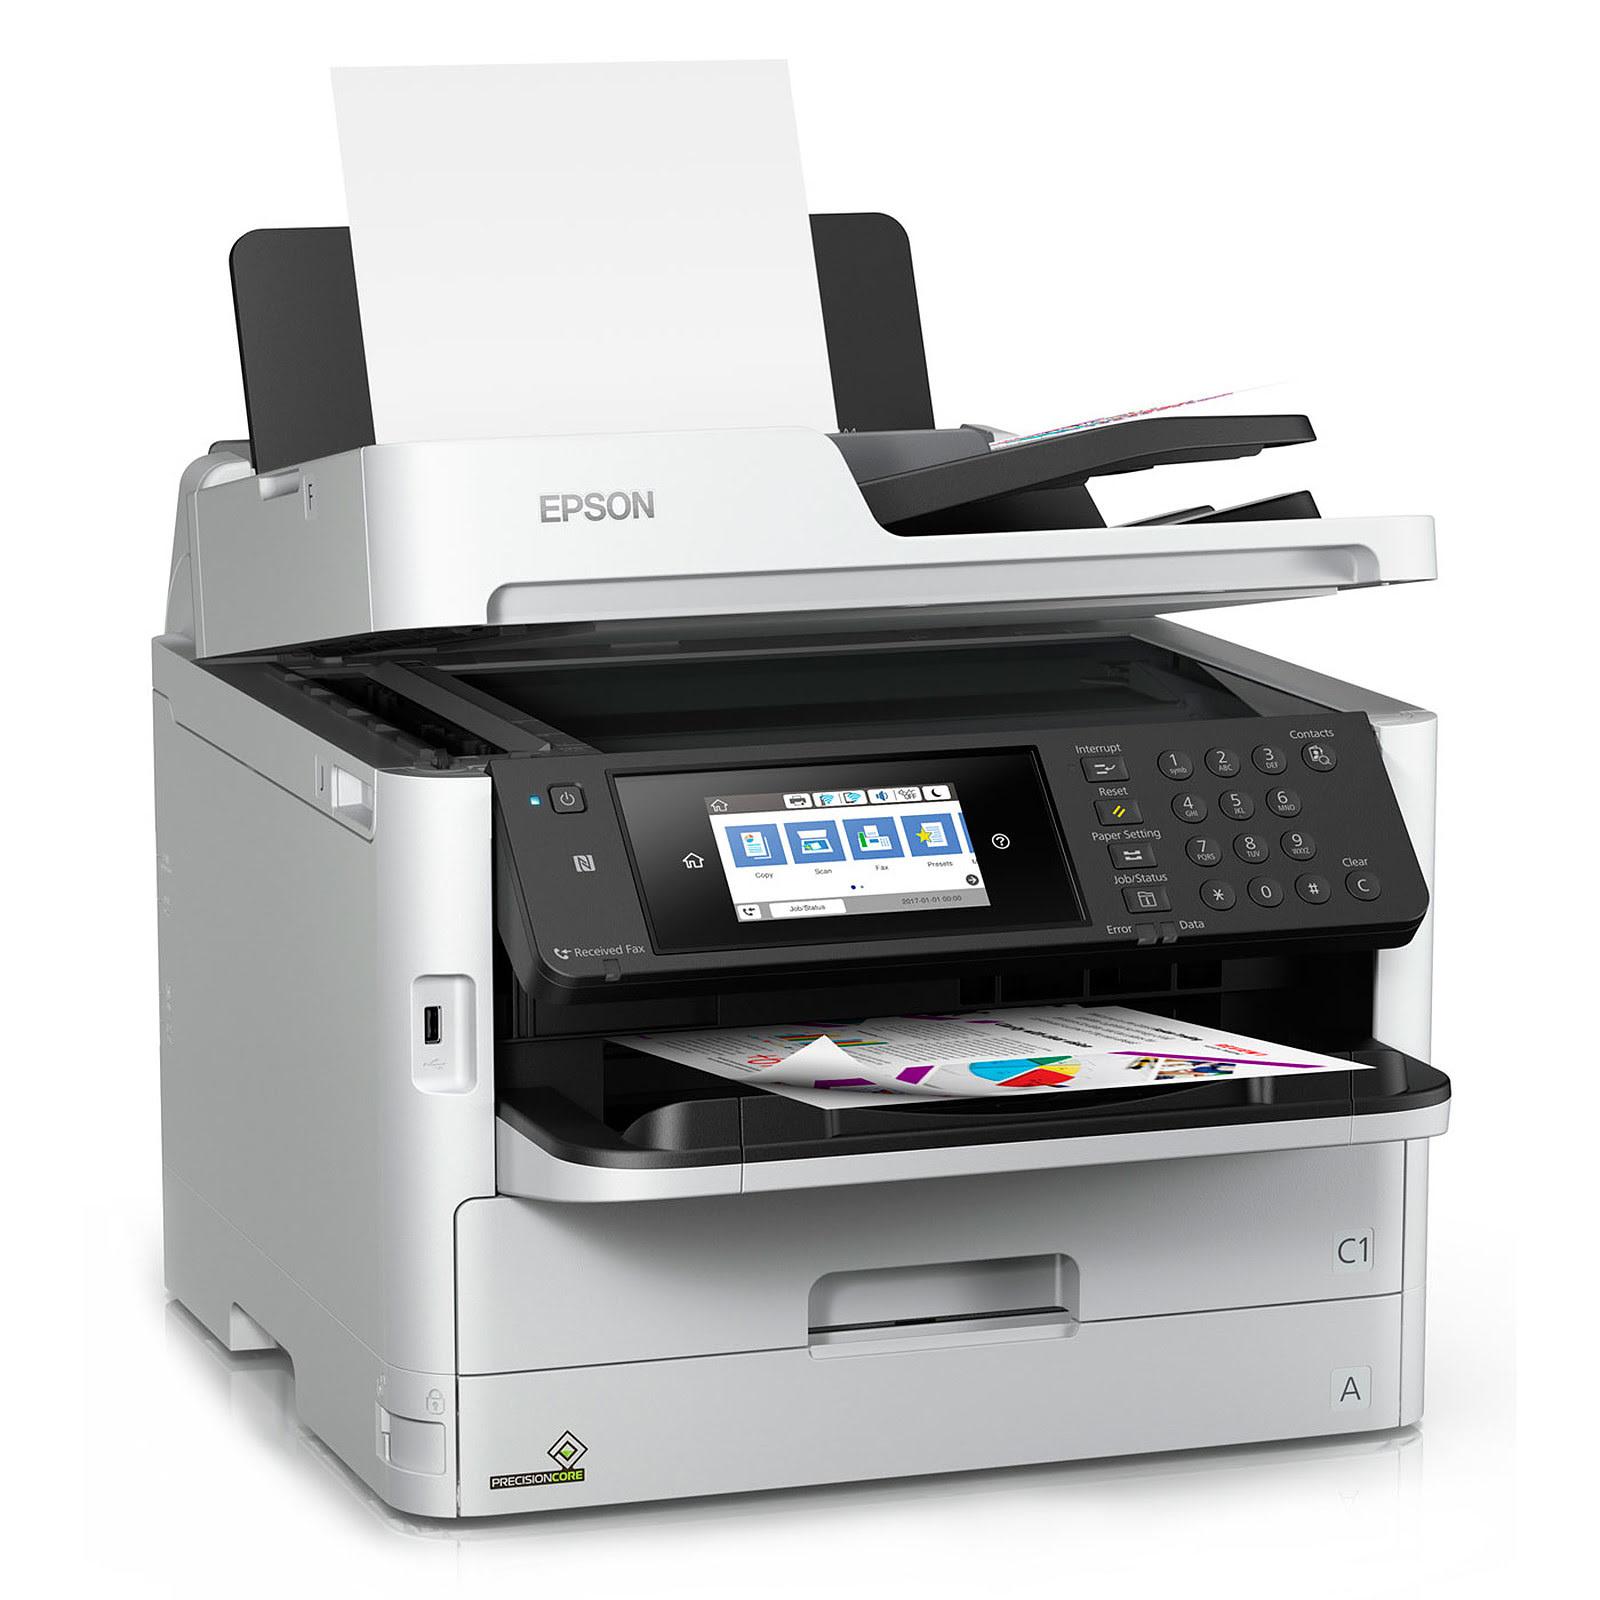 Imprimante multifonction Epson WorkForce Pro WF-C5790DWF - 4